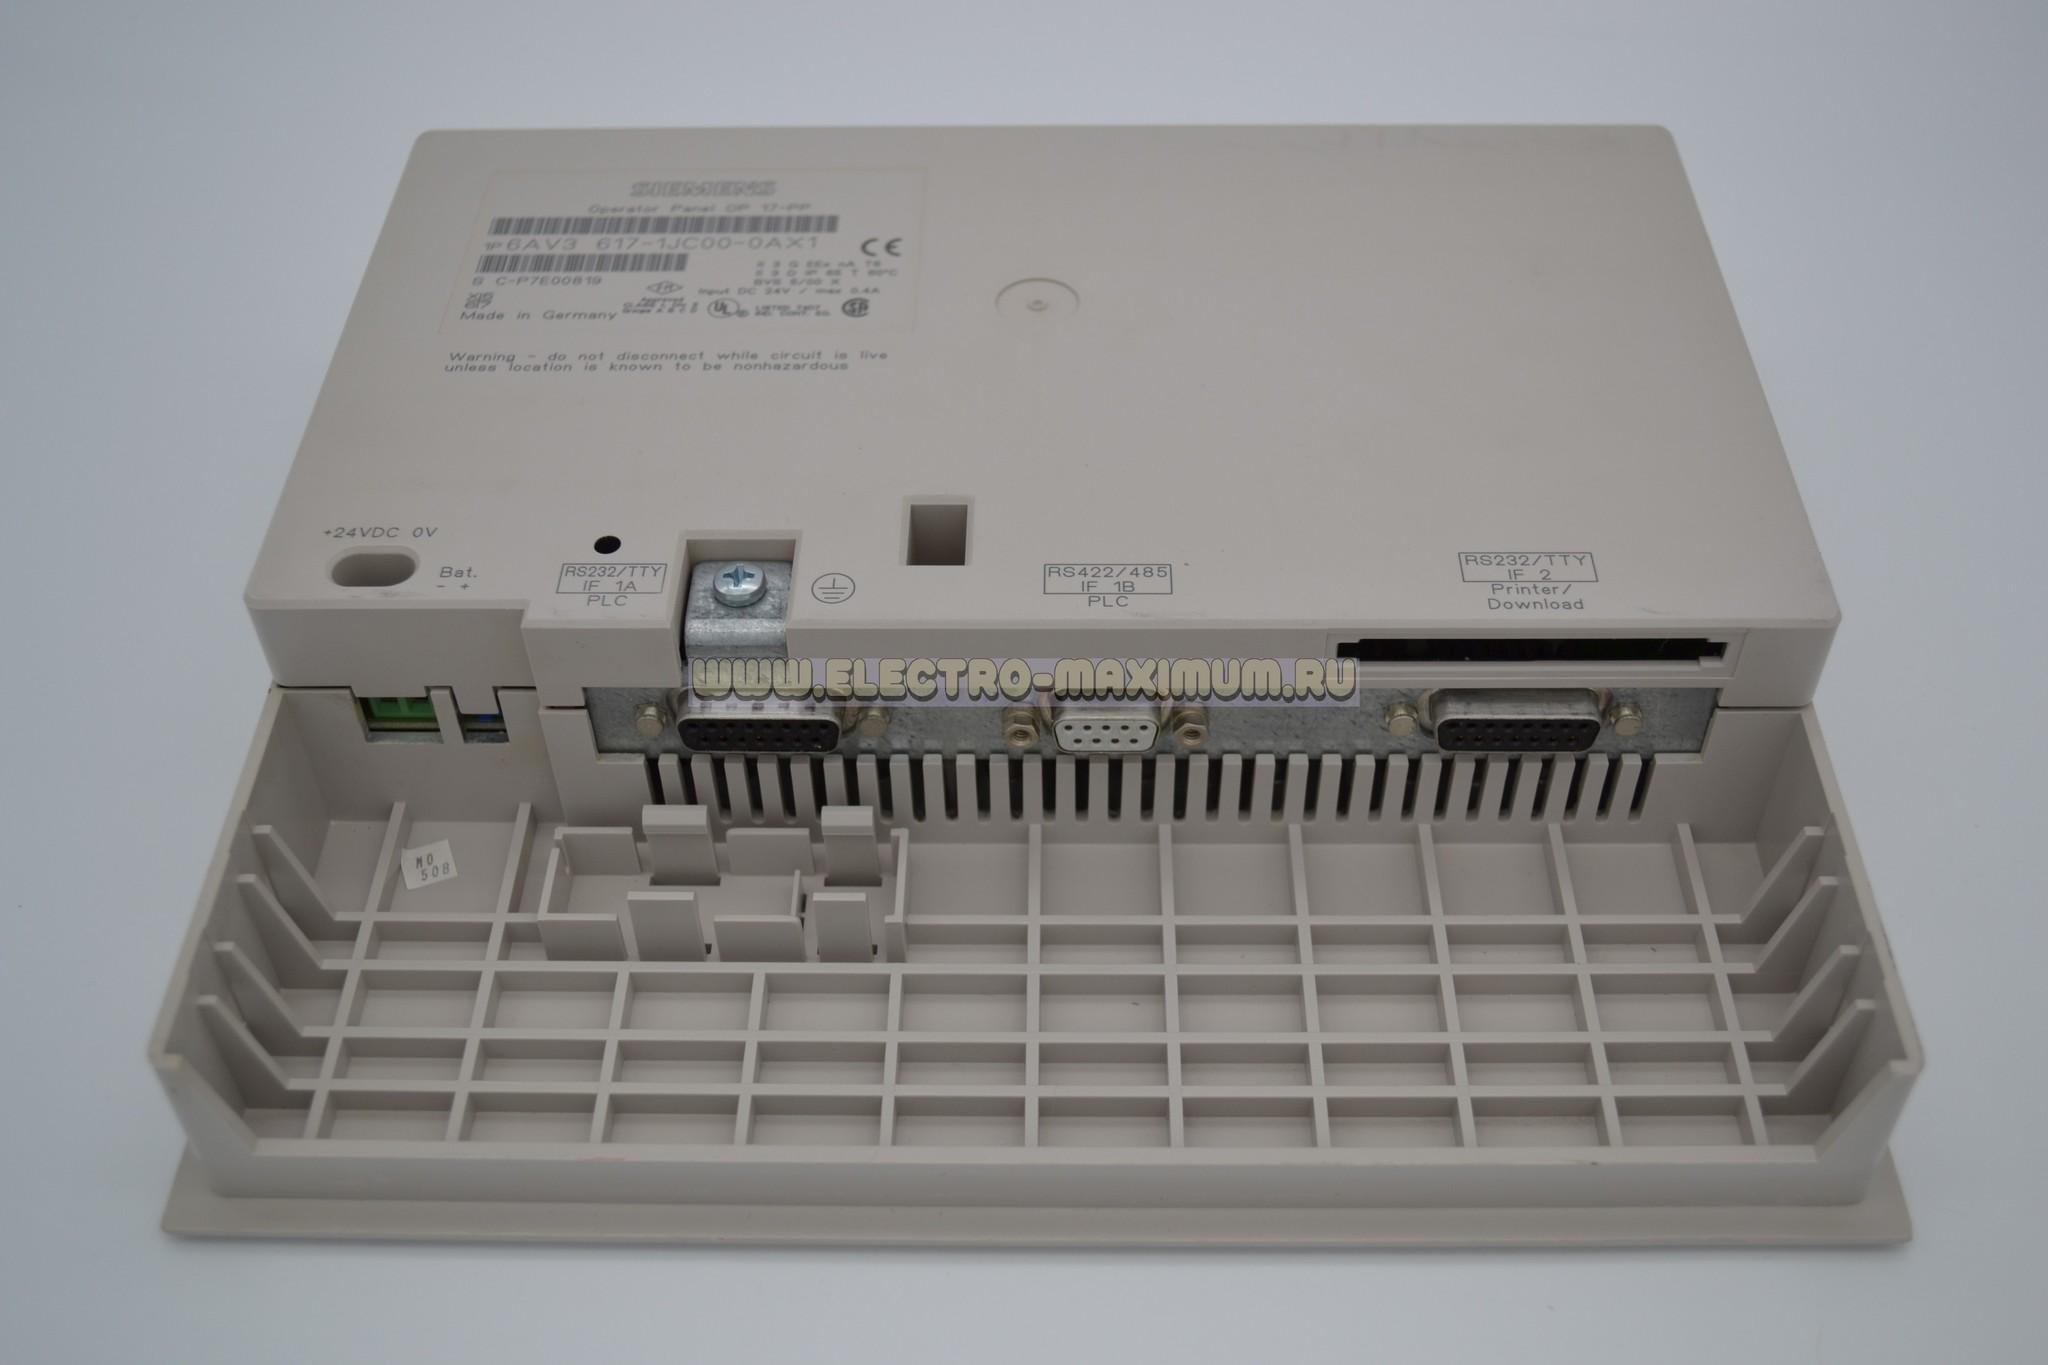 SIMATIC OP17/PP 6AV3 617-1JC00-0AX1